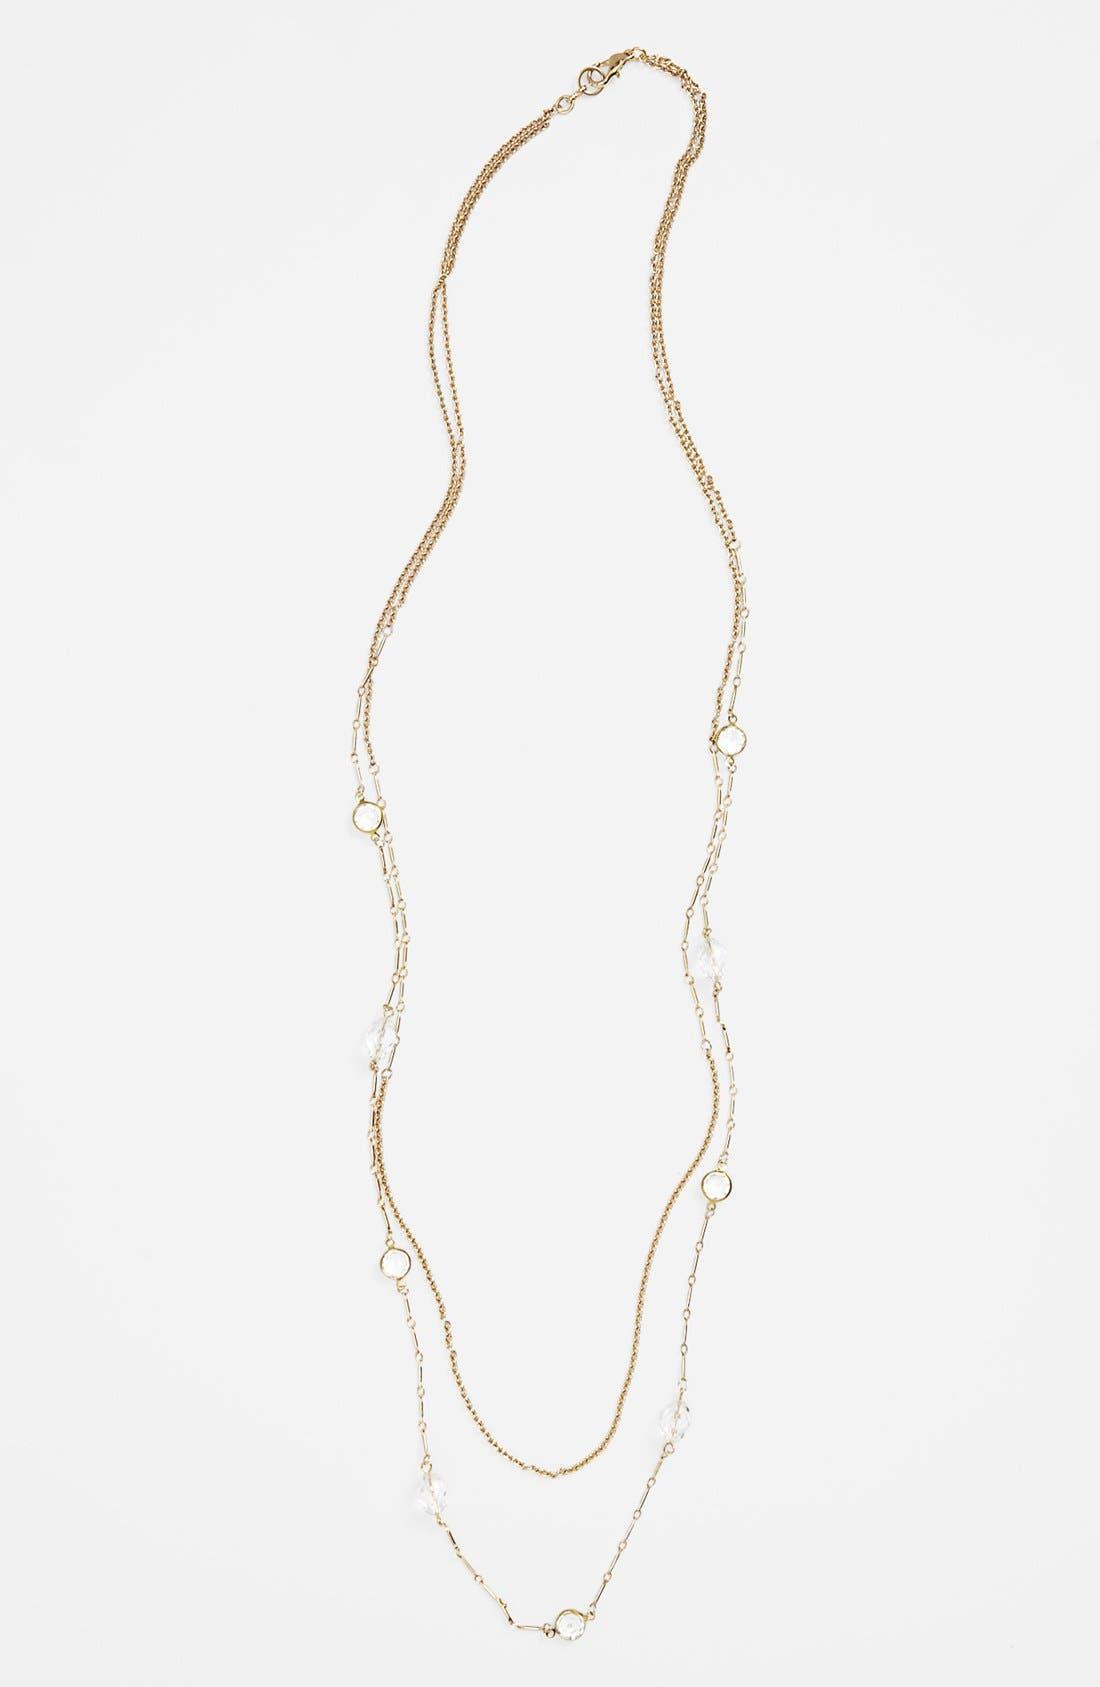 Main Image - Rachel Layering Chain Necklace